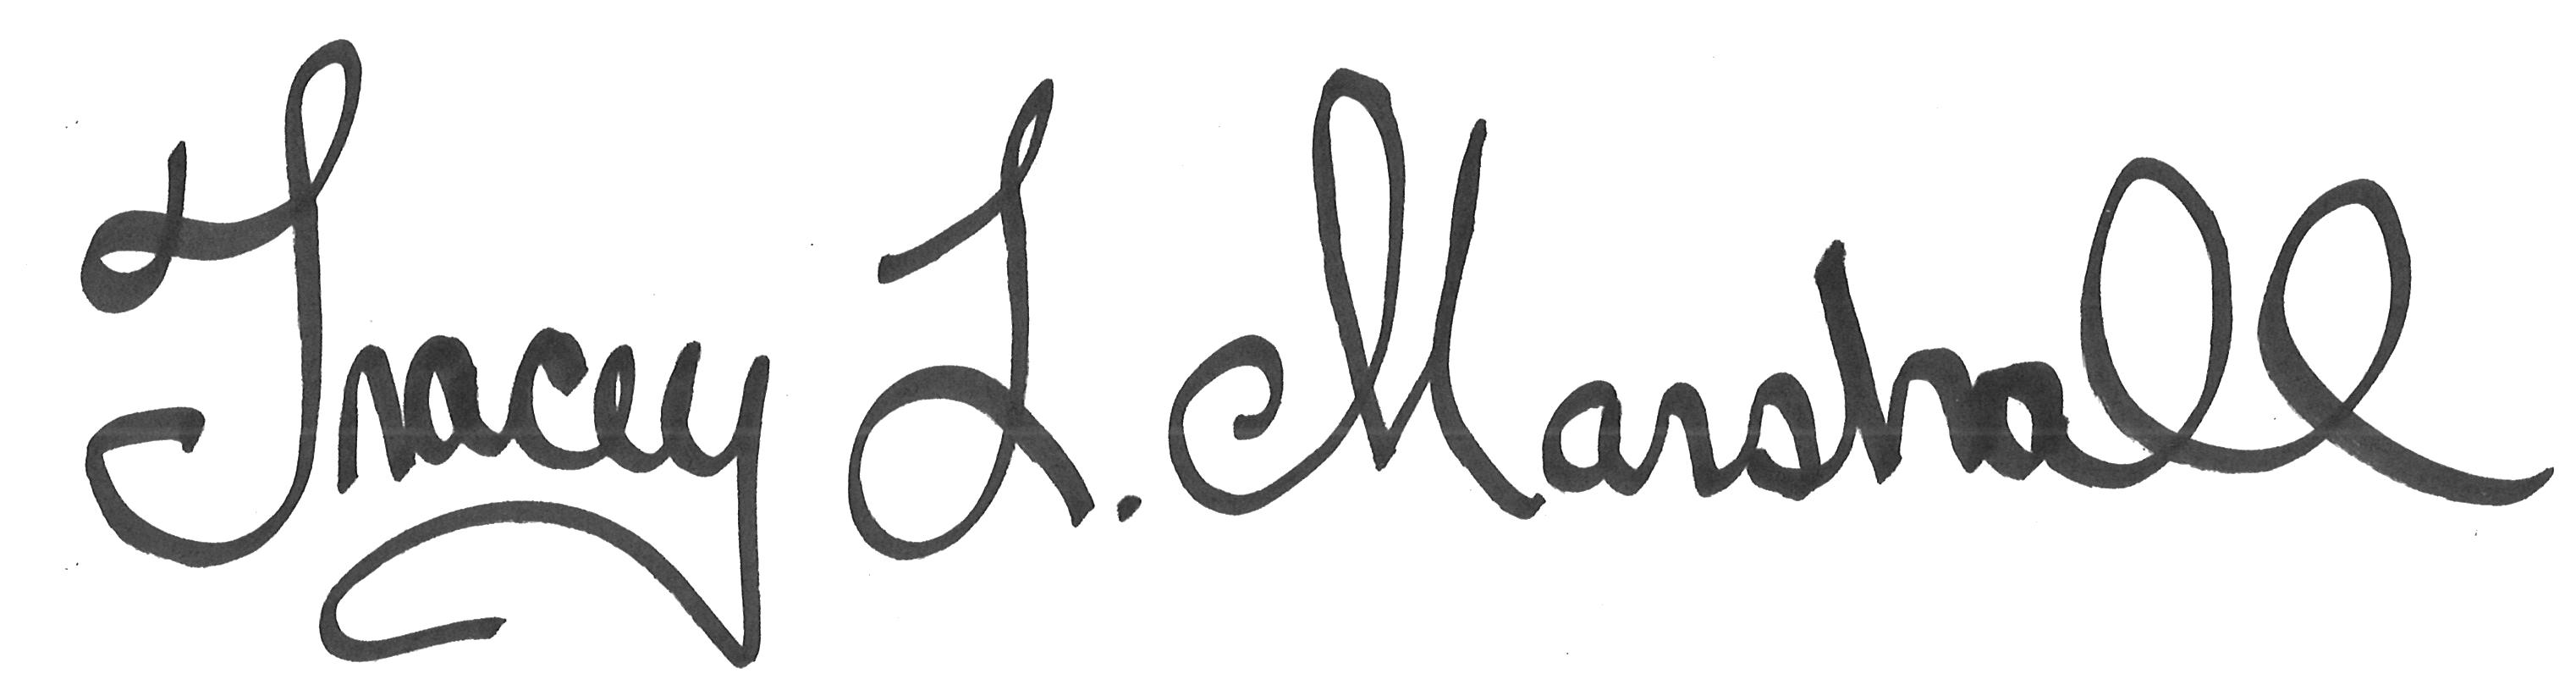 Tracey L. Marshall Signature